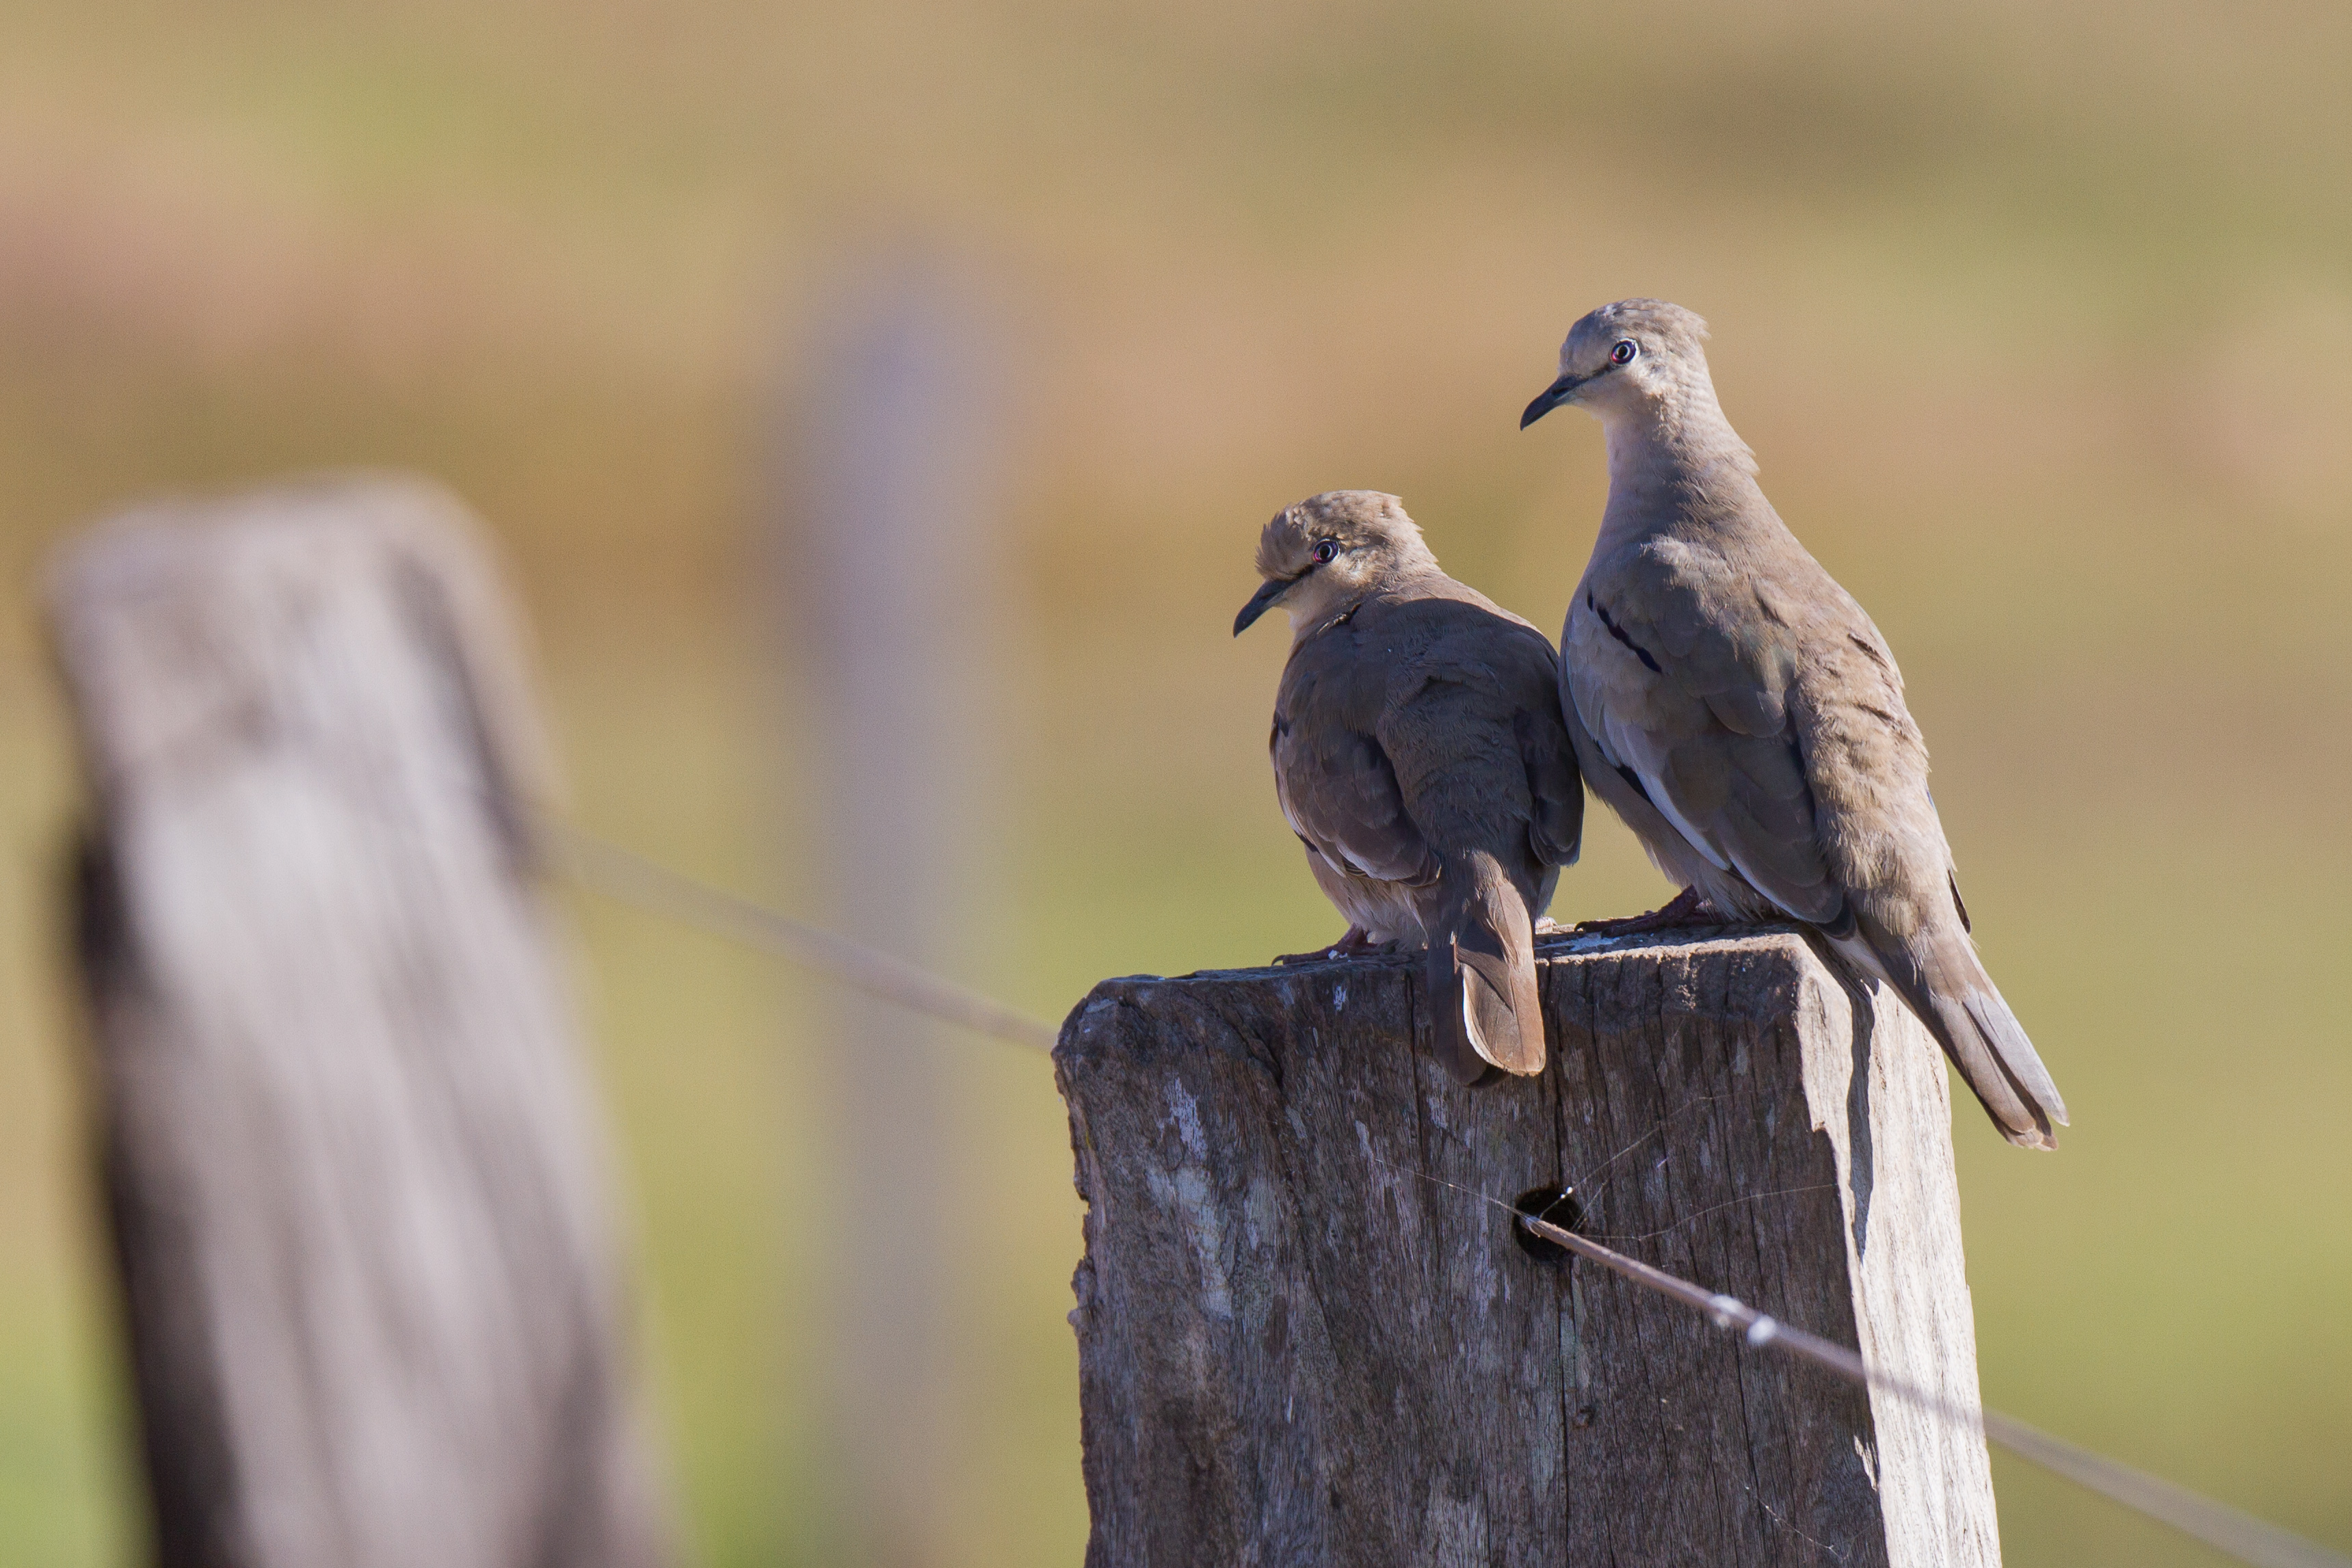 Pigeons picazuro